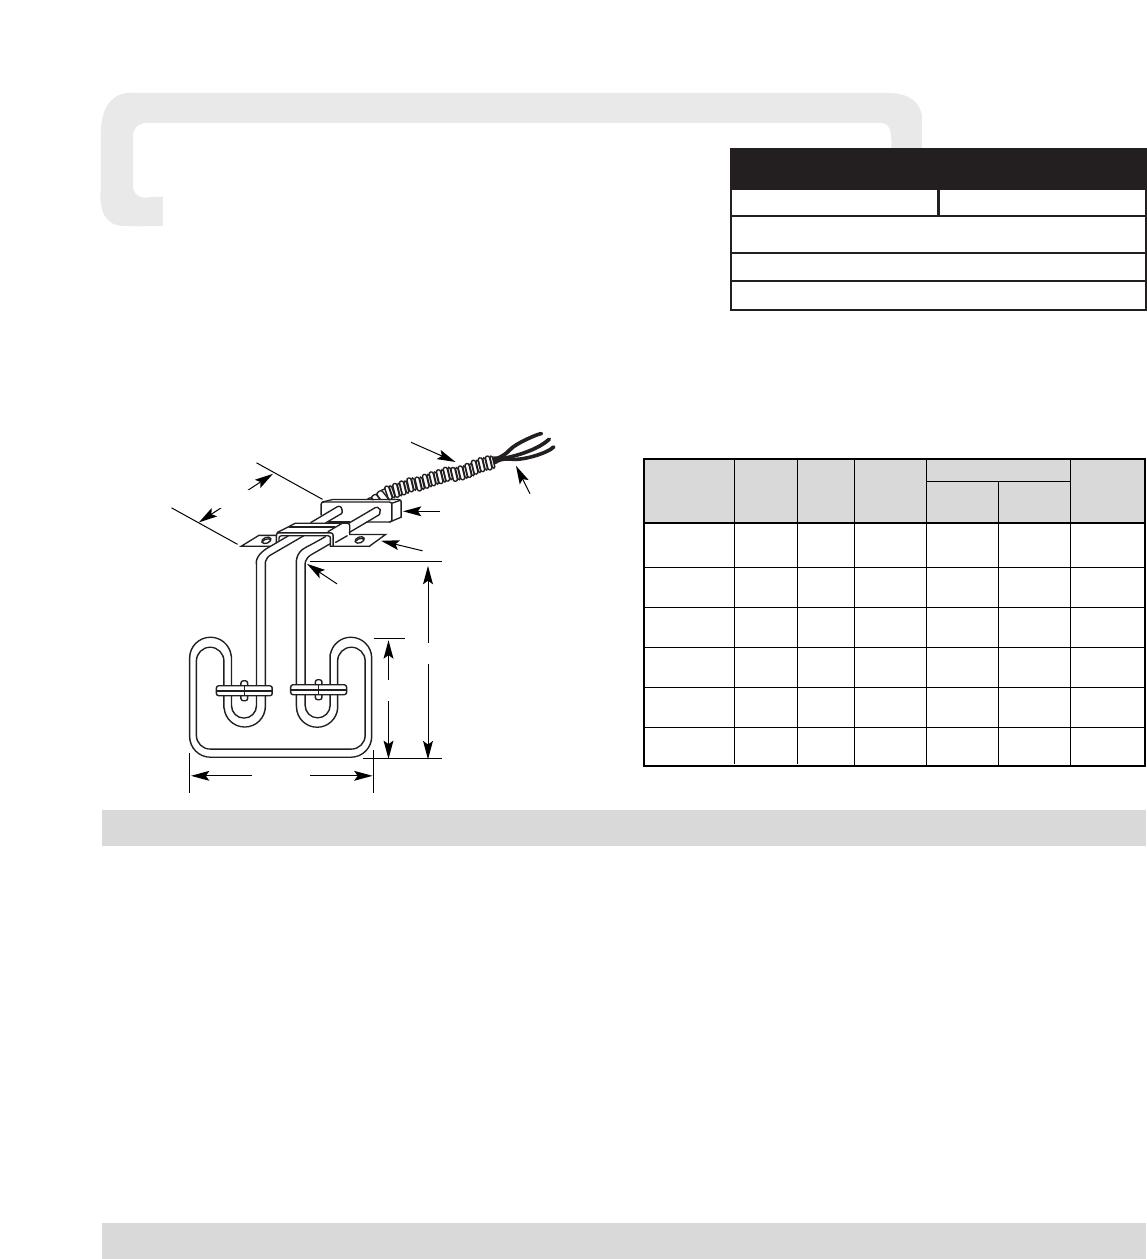 Heat Trace Wiring Diagram. . Wiring Diagram on